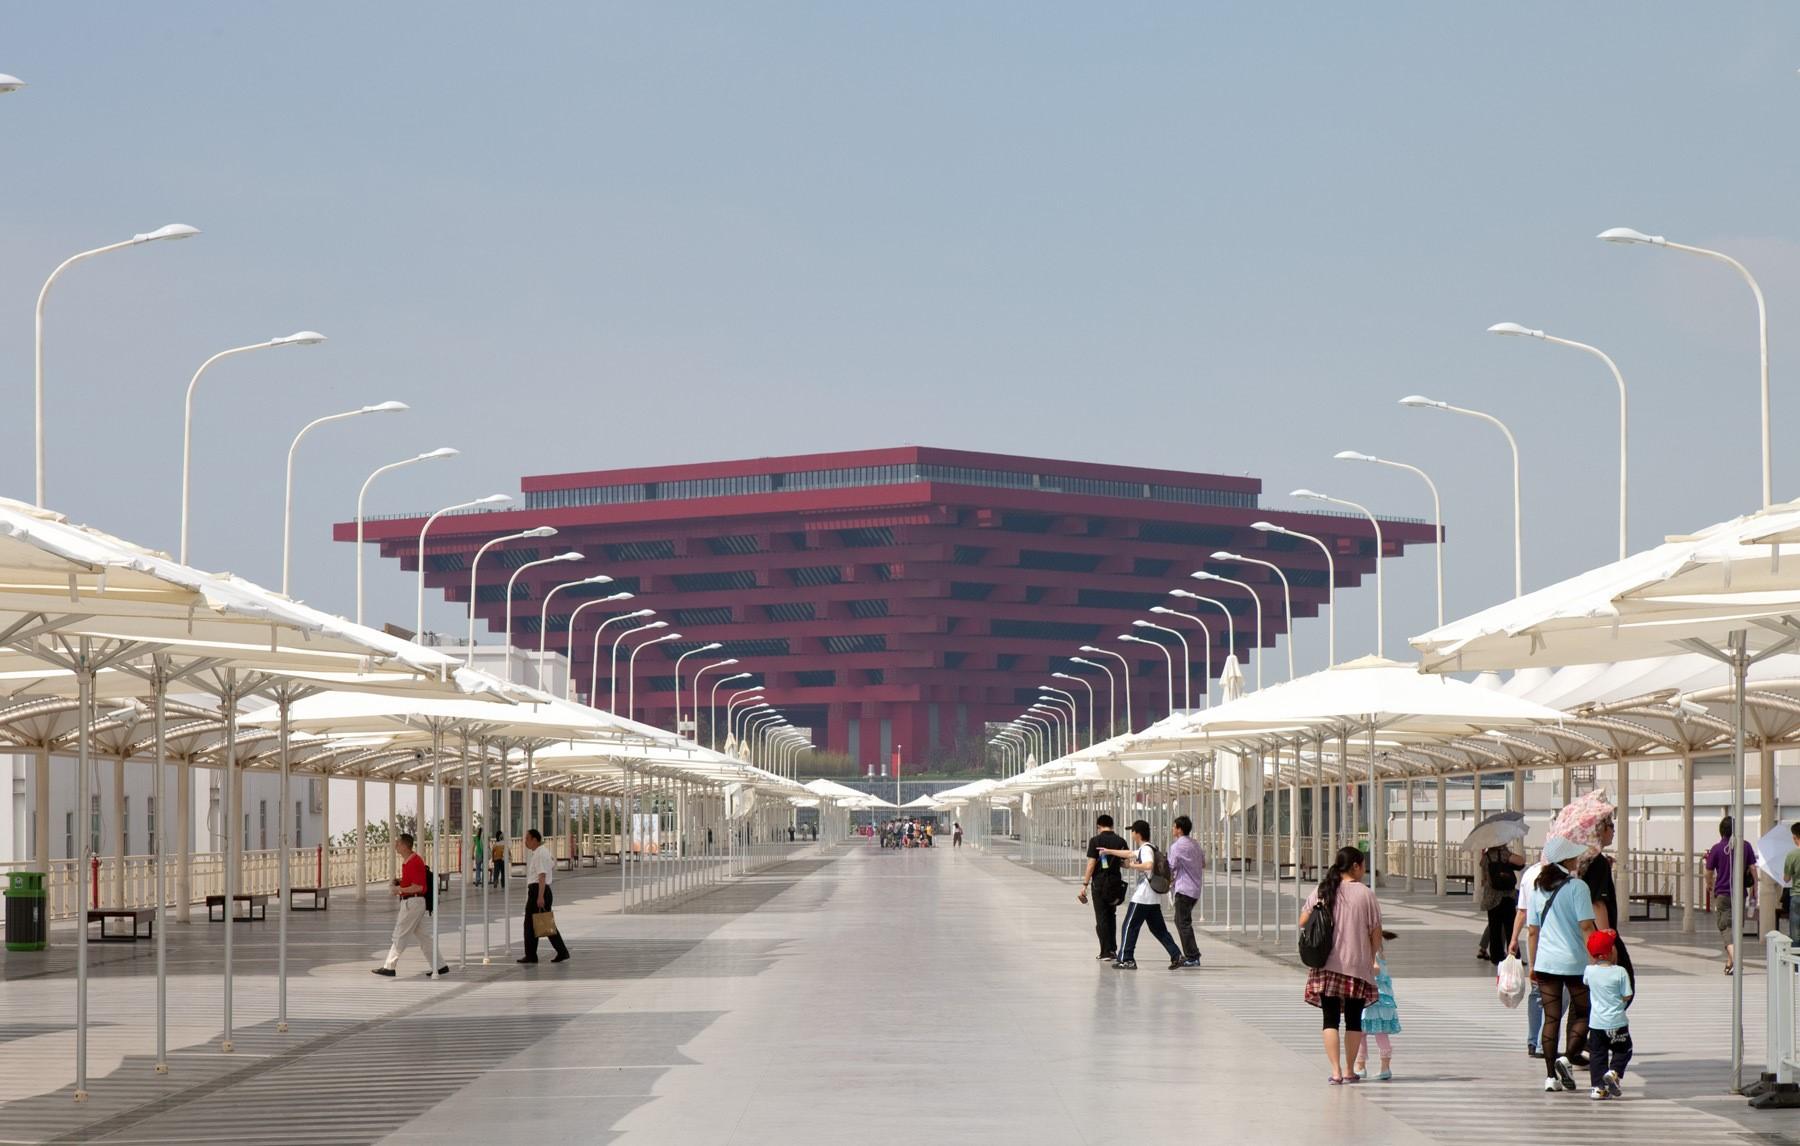 China pavilion, Shanghai Expo, 2010